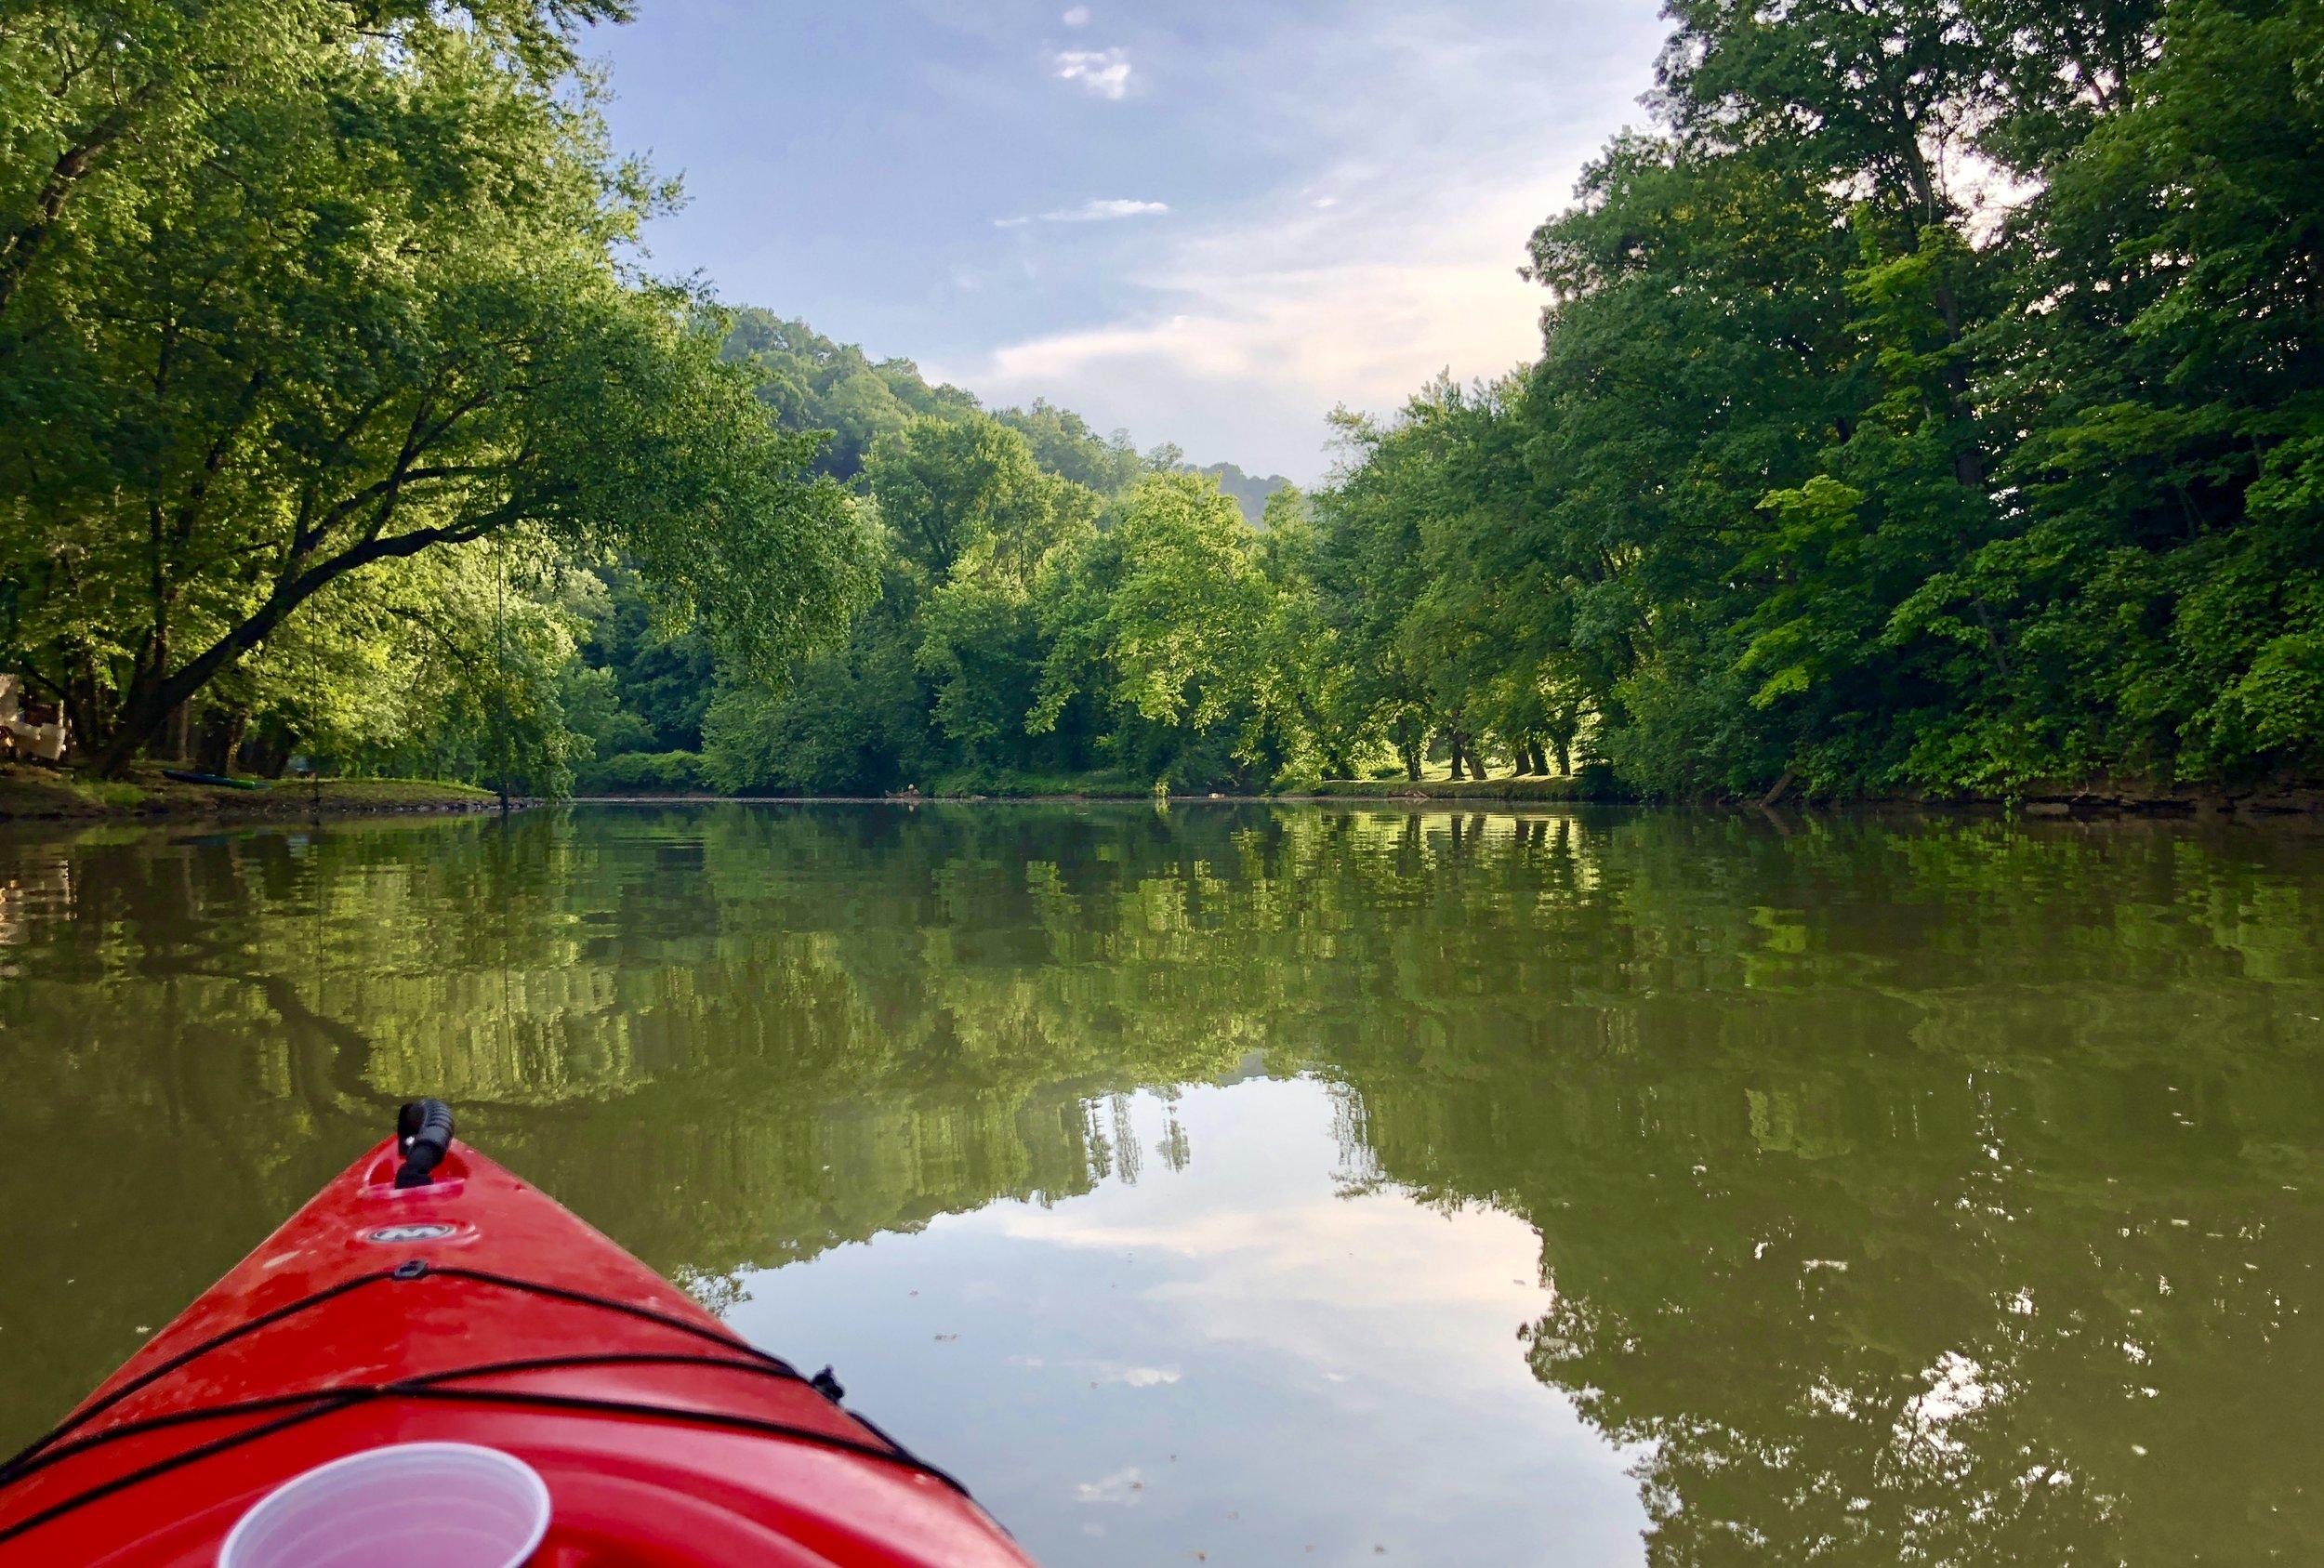 Kayaking on the Little Sandy River.